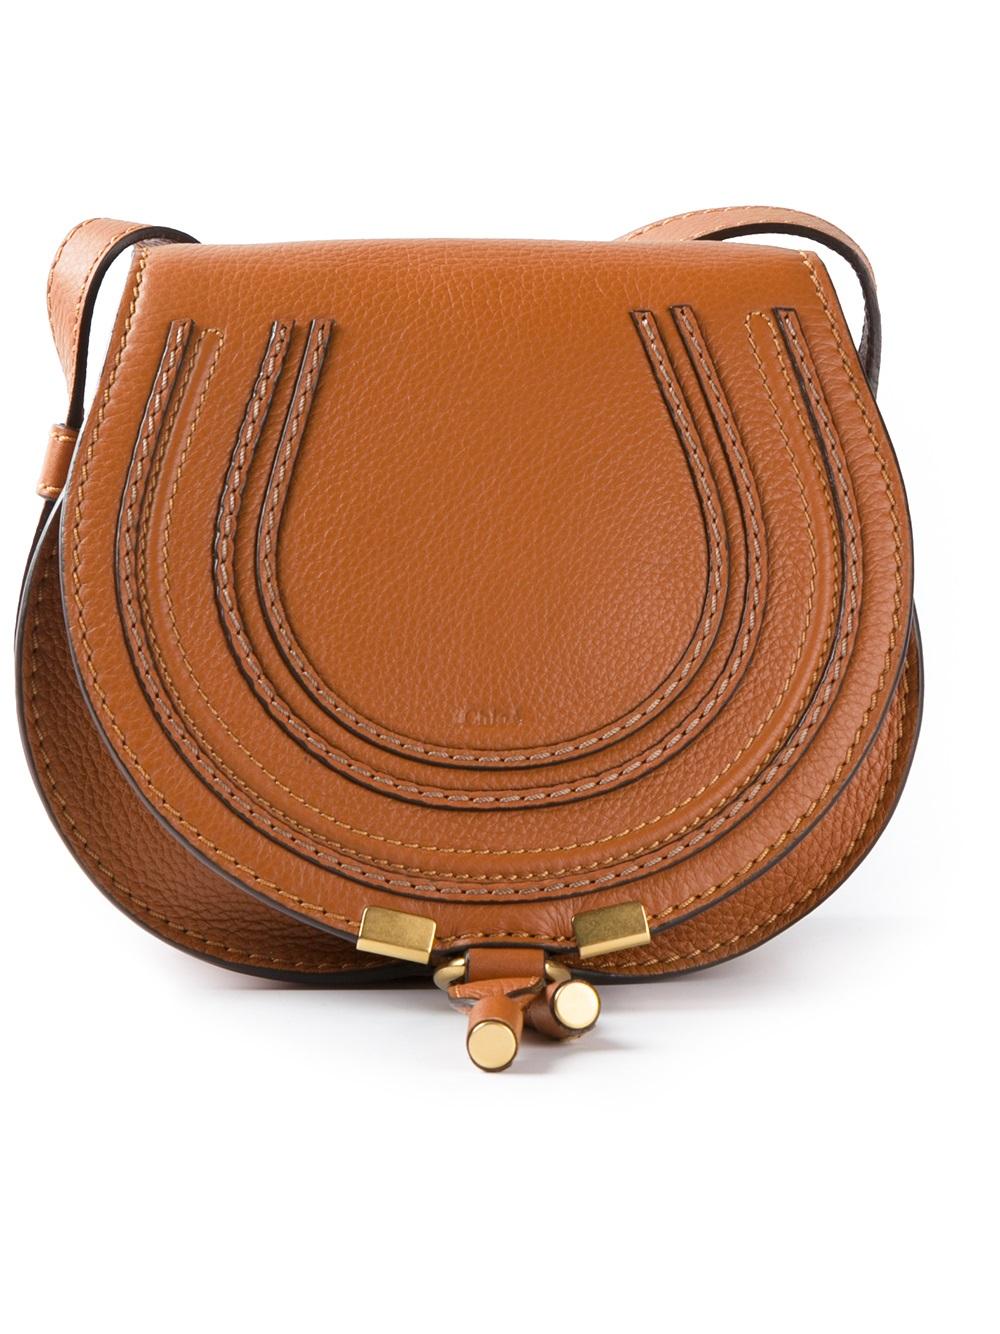 Chlo¨¦ \u0026#39;mini Marcie\u0026#39; Cross Body Bag in Brown | Lyst